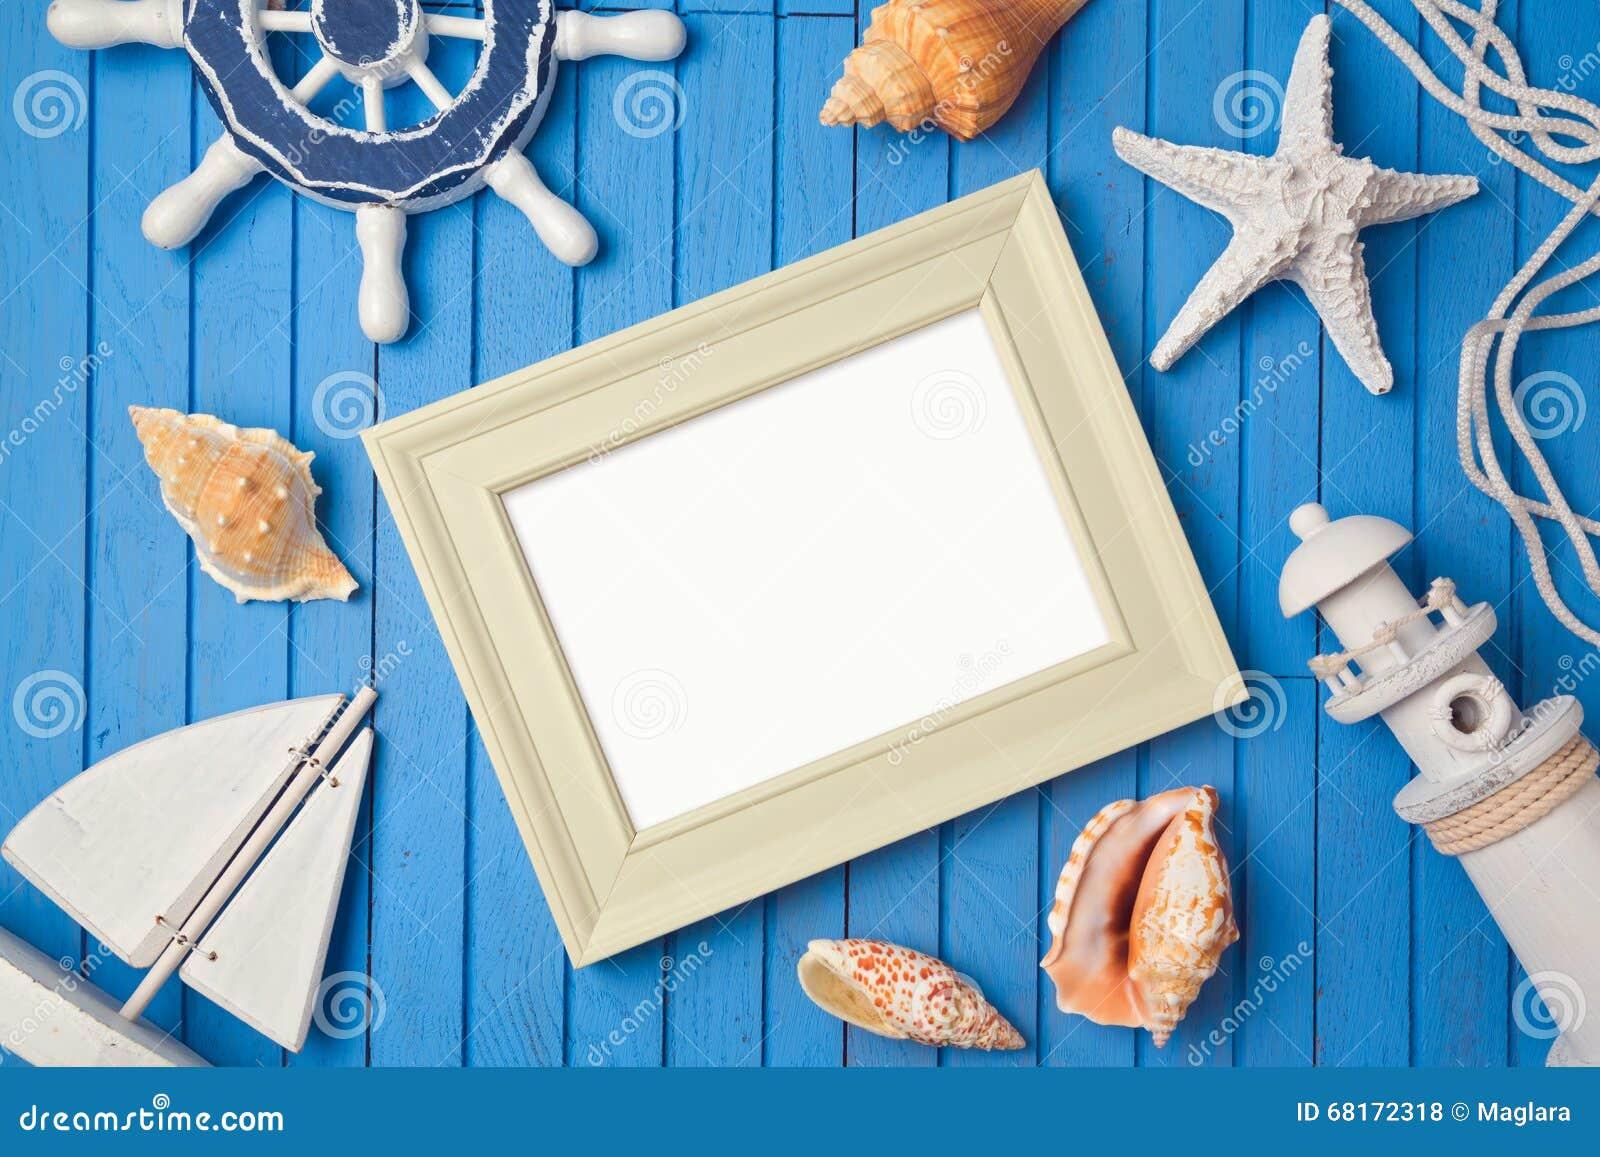 summer holiday poster frame mock up template view from above summer holiday poster frame mock up template view from above flat lay